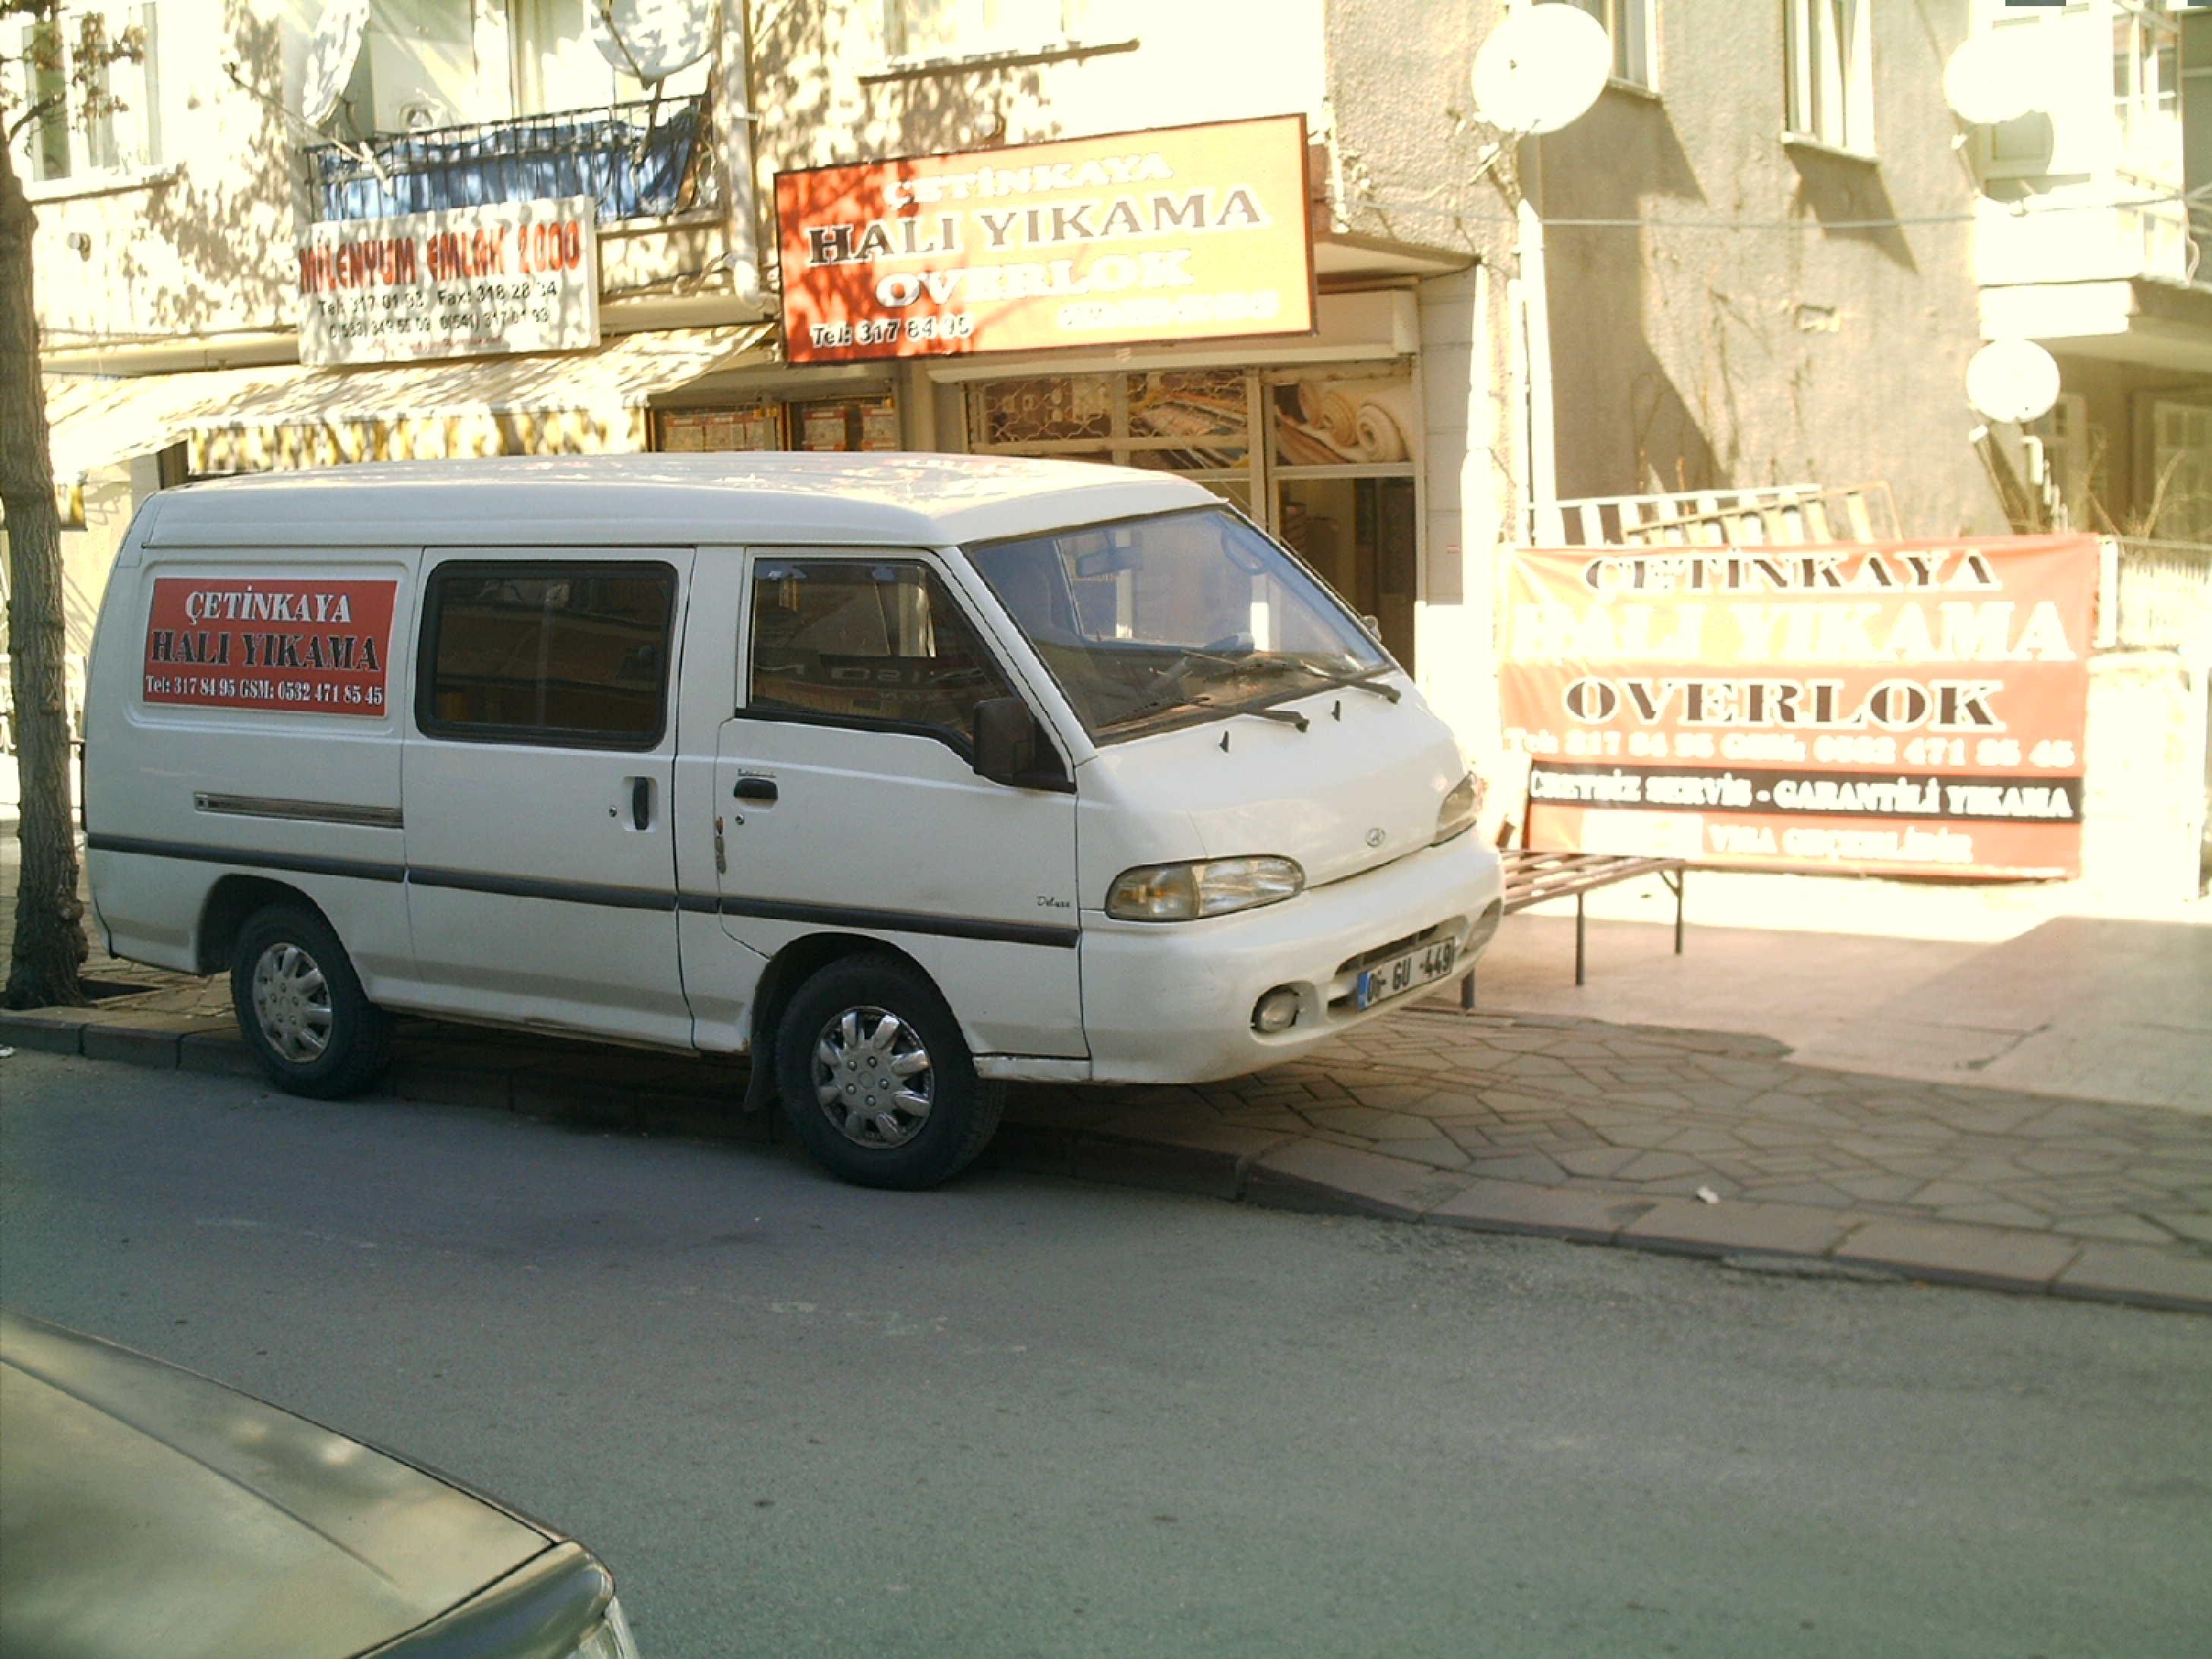 yavuz_selim_hali_yikama_servis